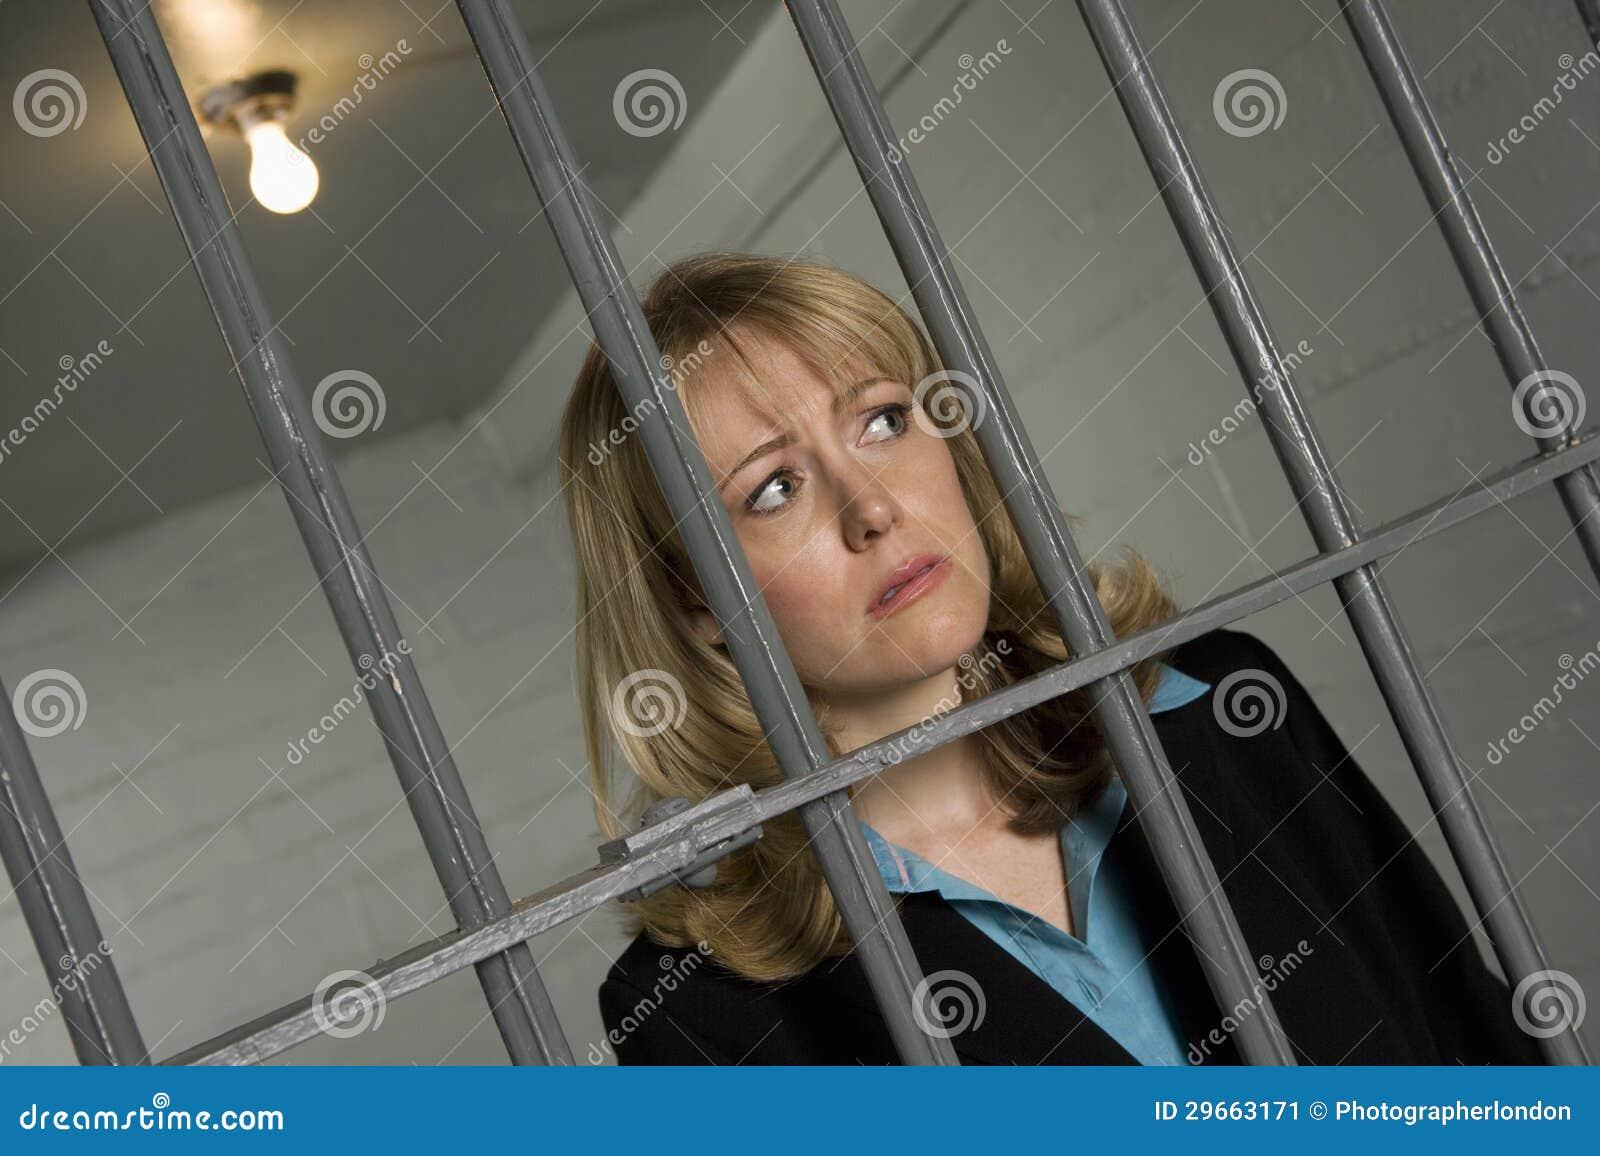 Female Criminal Behind Bars In Jail Stock Image Image